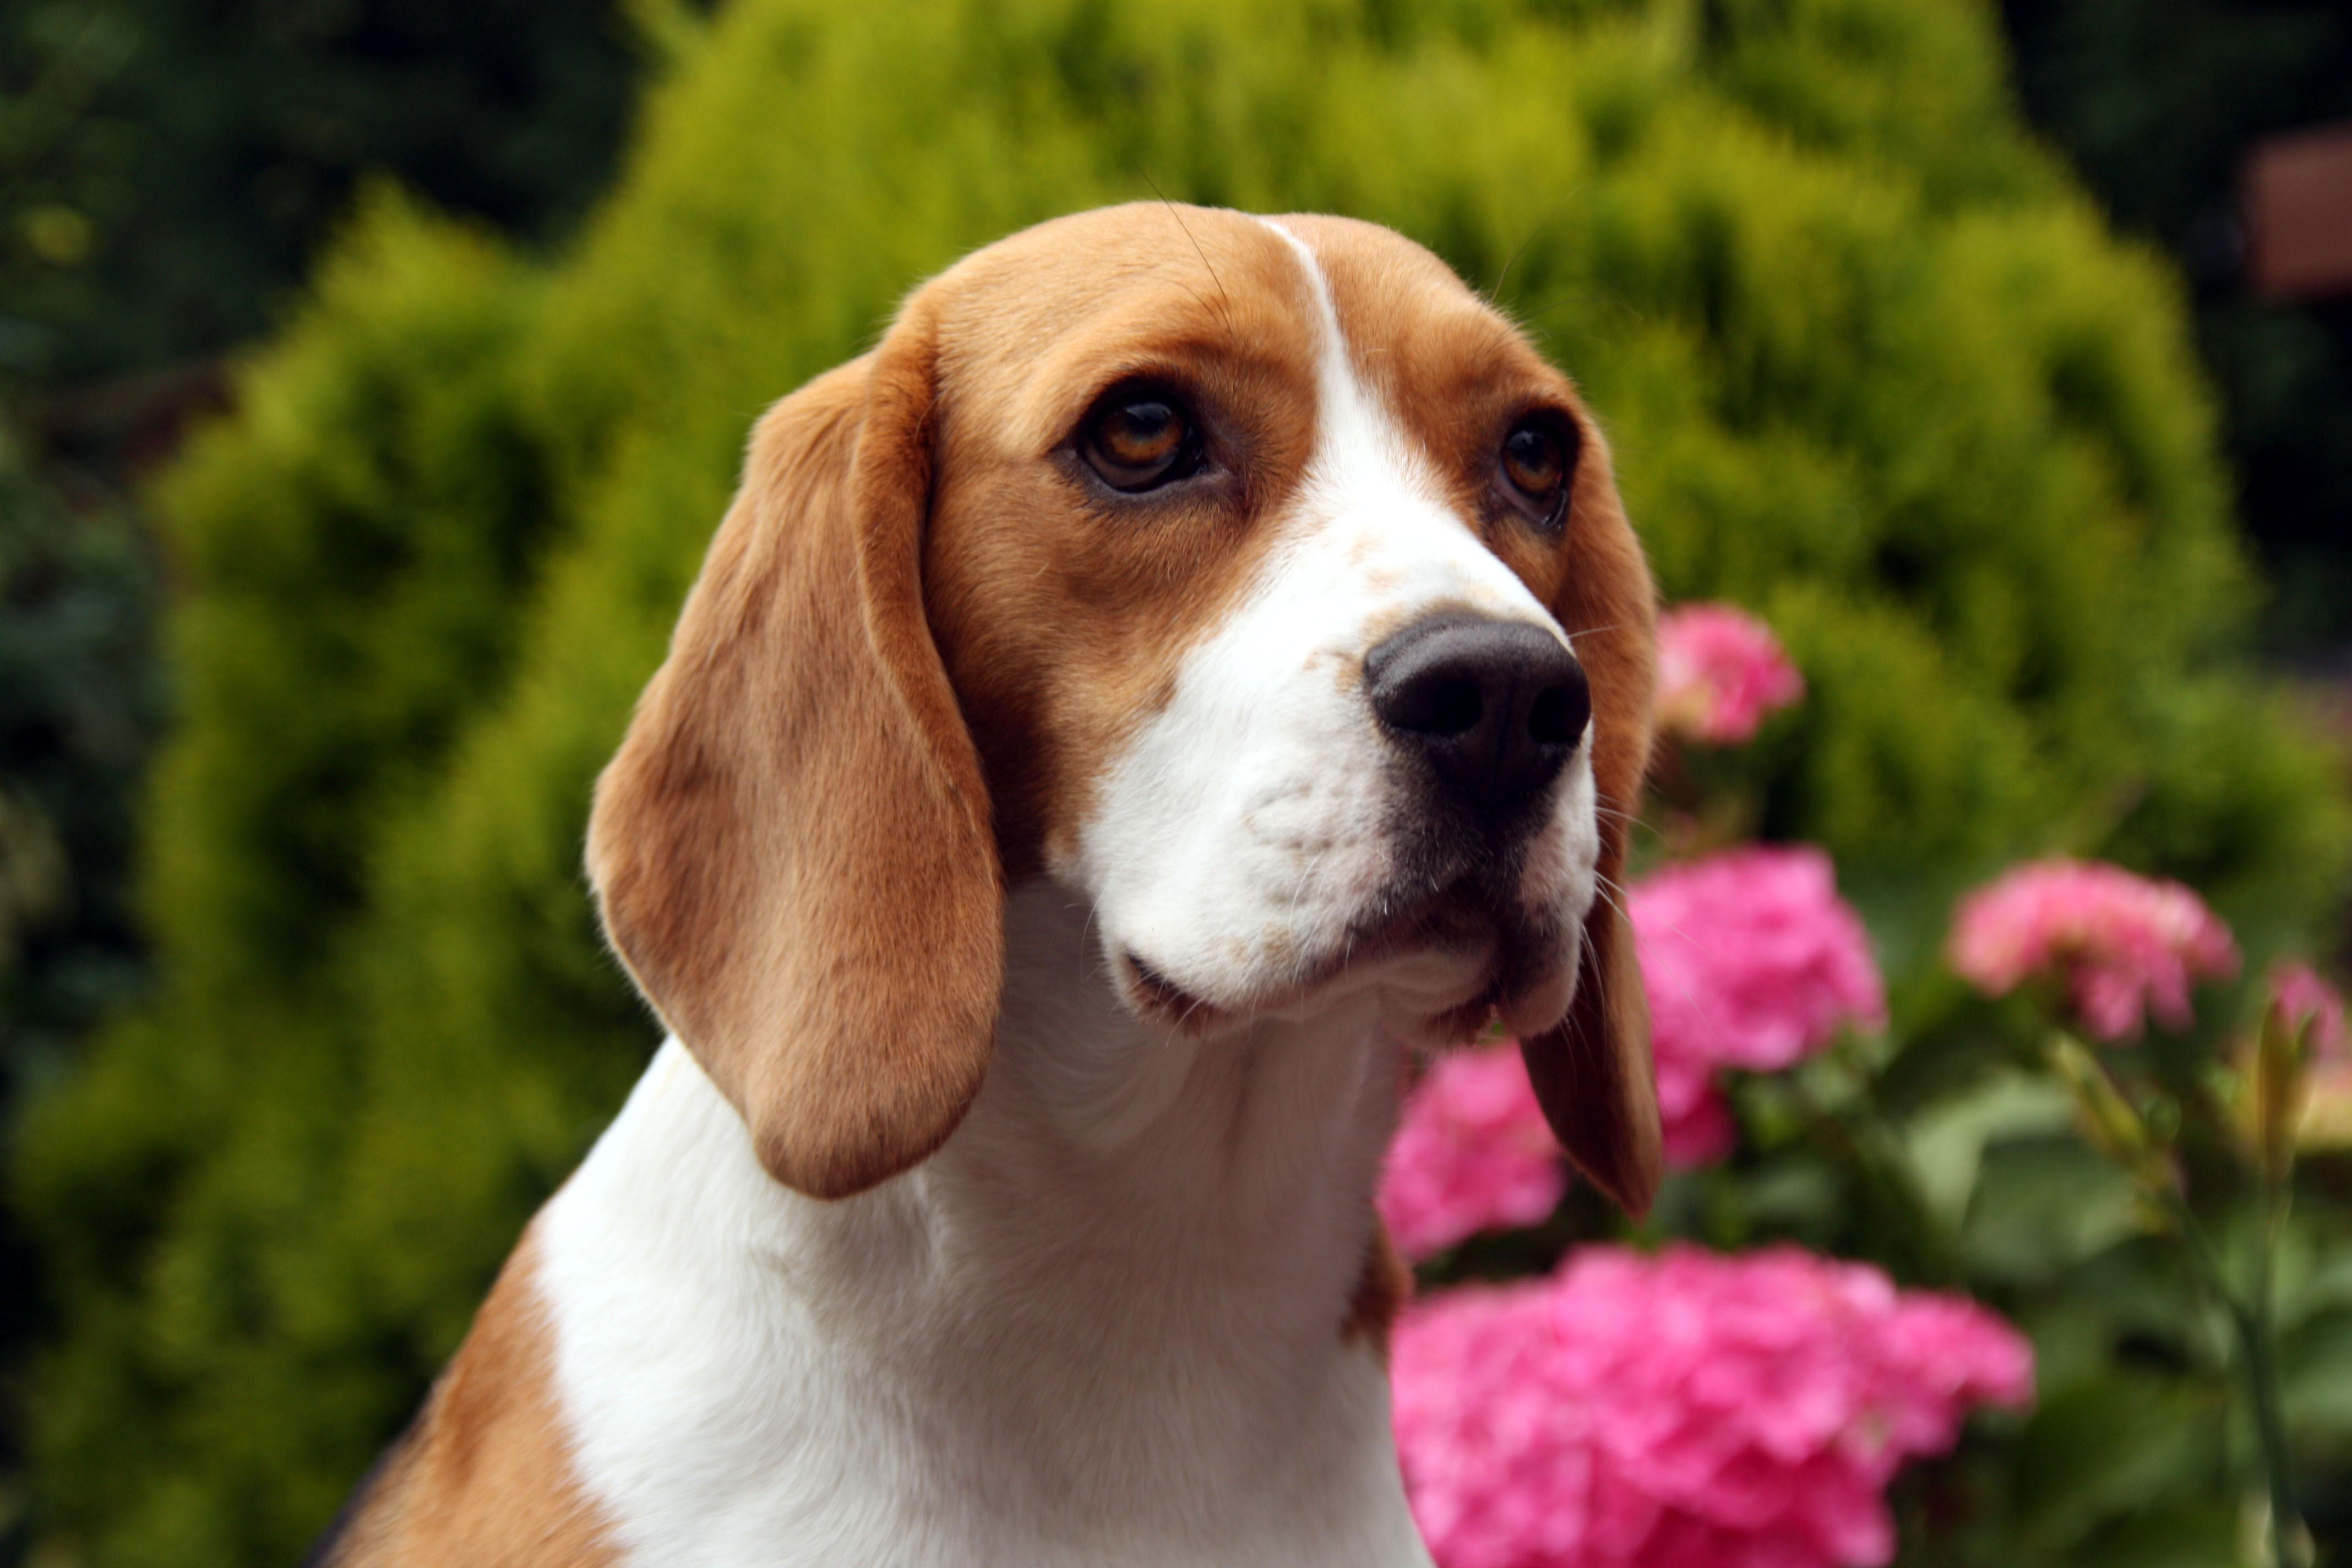 Canine Training Biting Problems